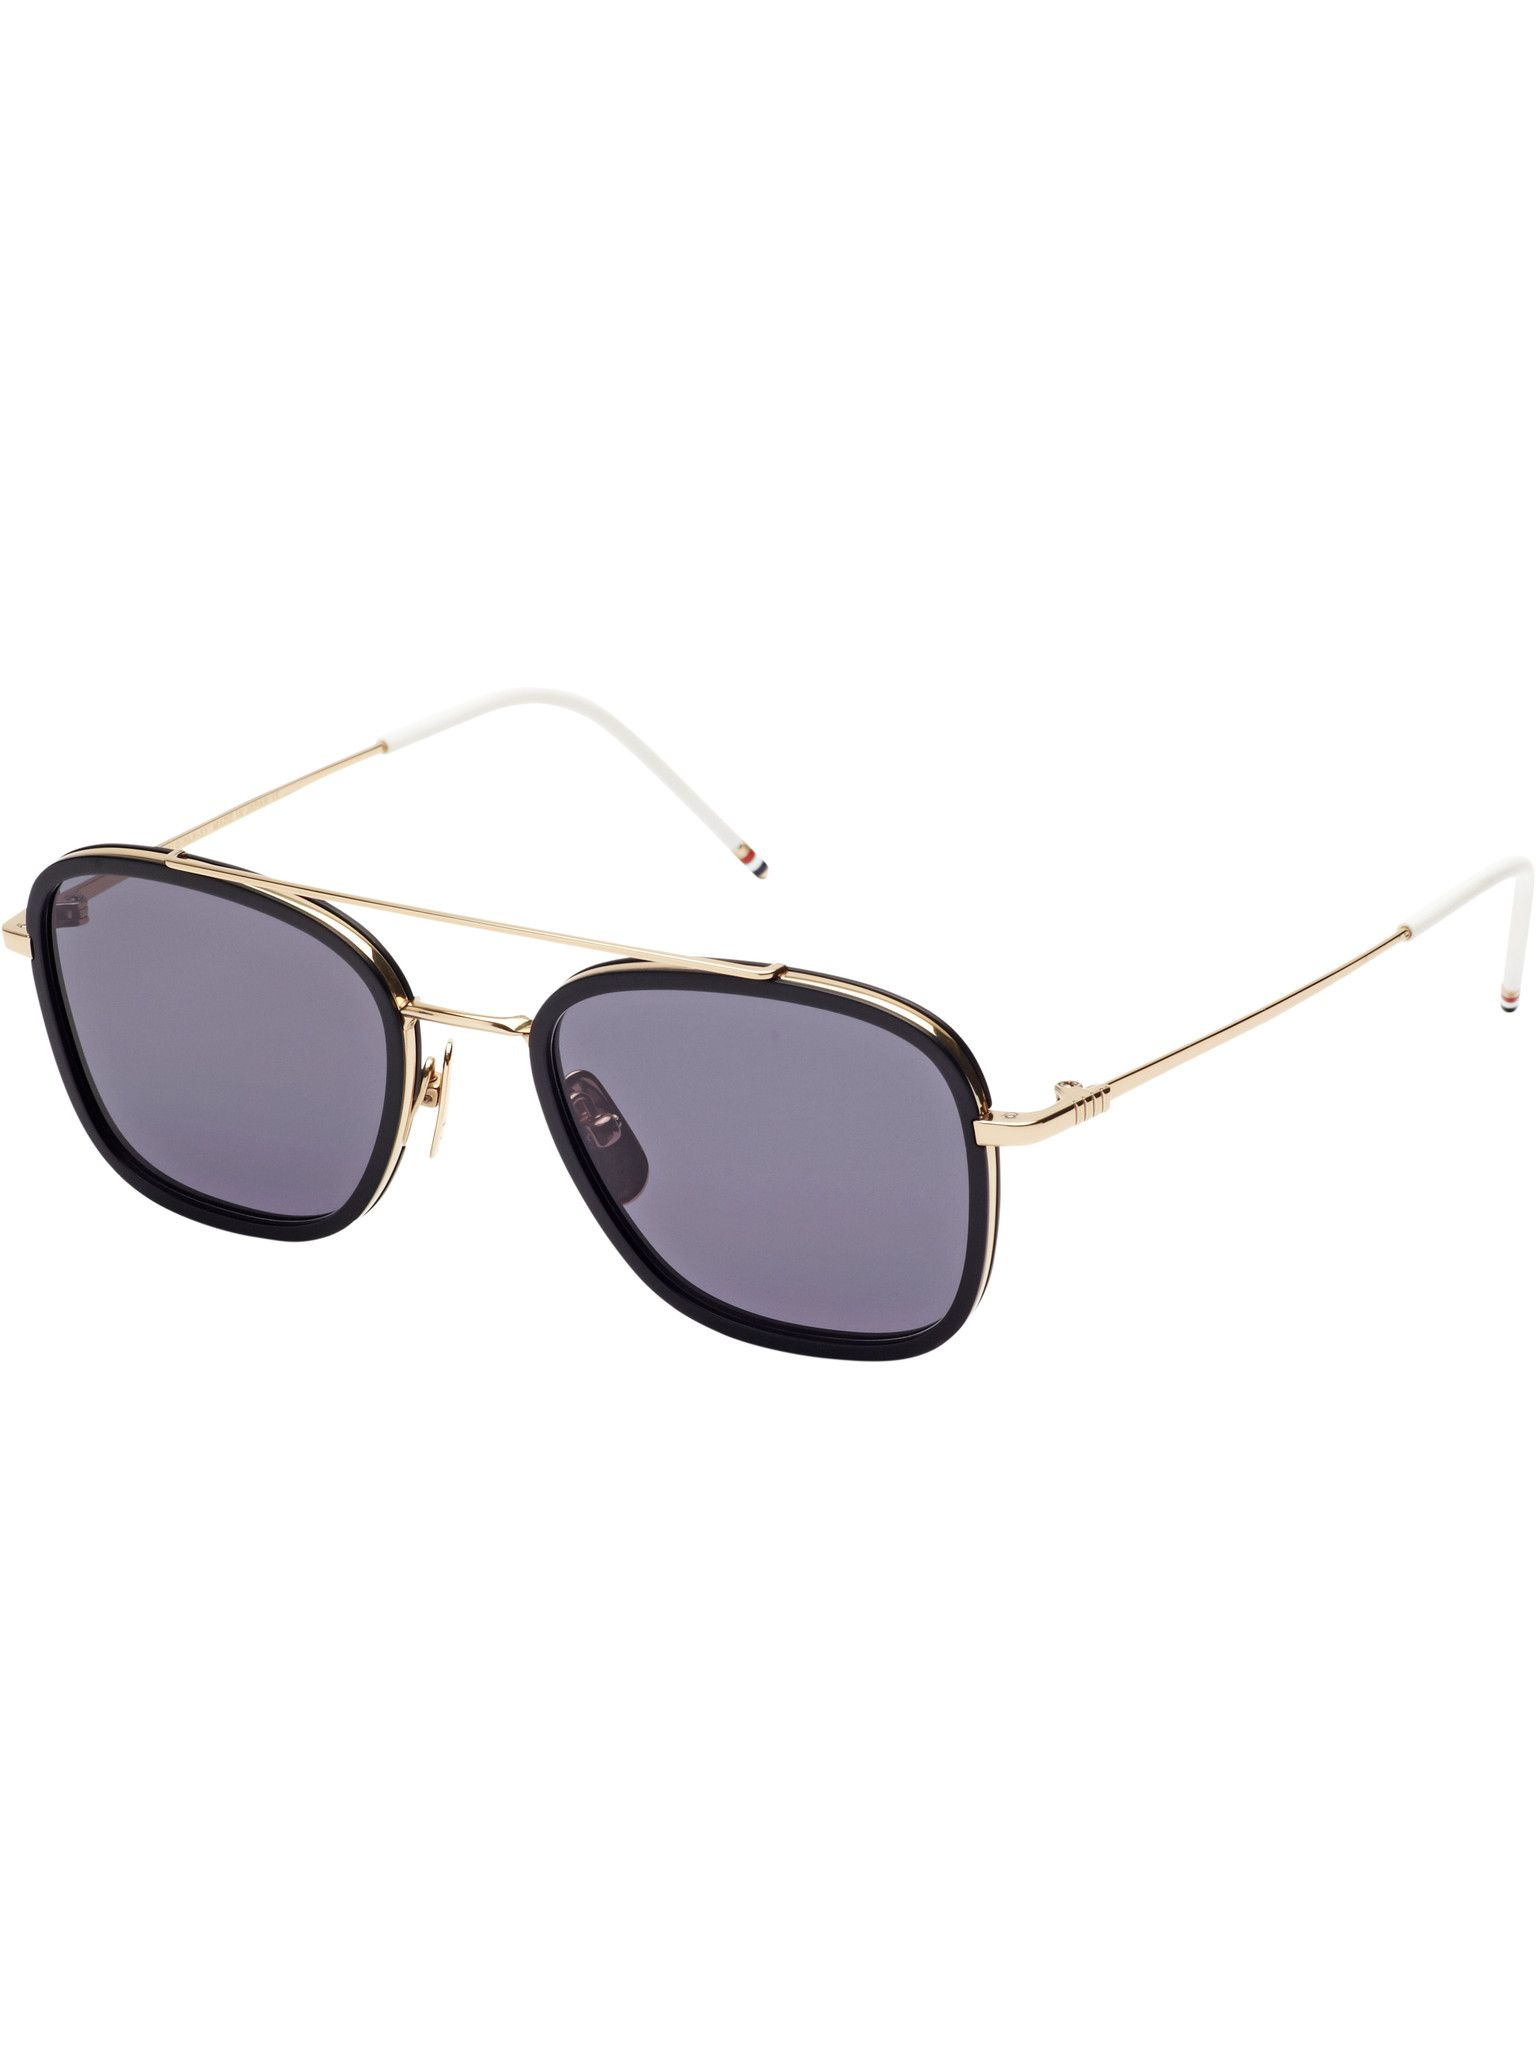 4273983ad3a Thom Browne TB-800-A Sunglasses